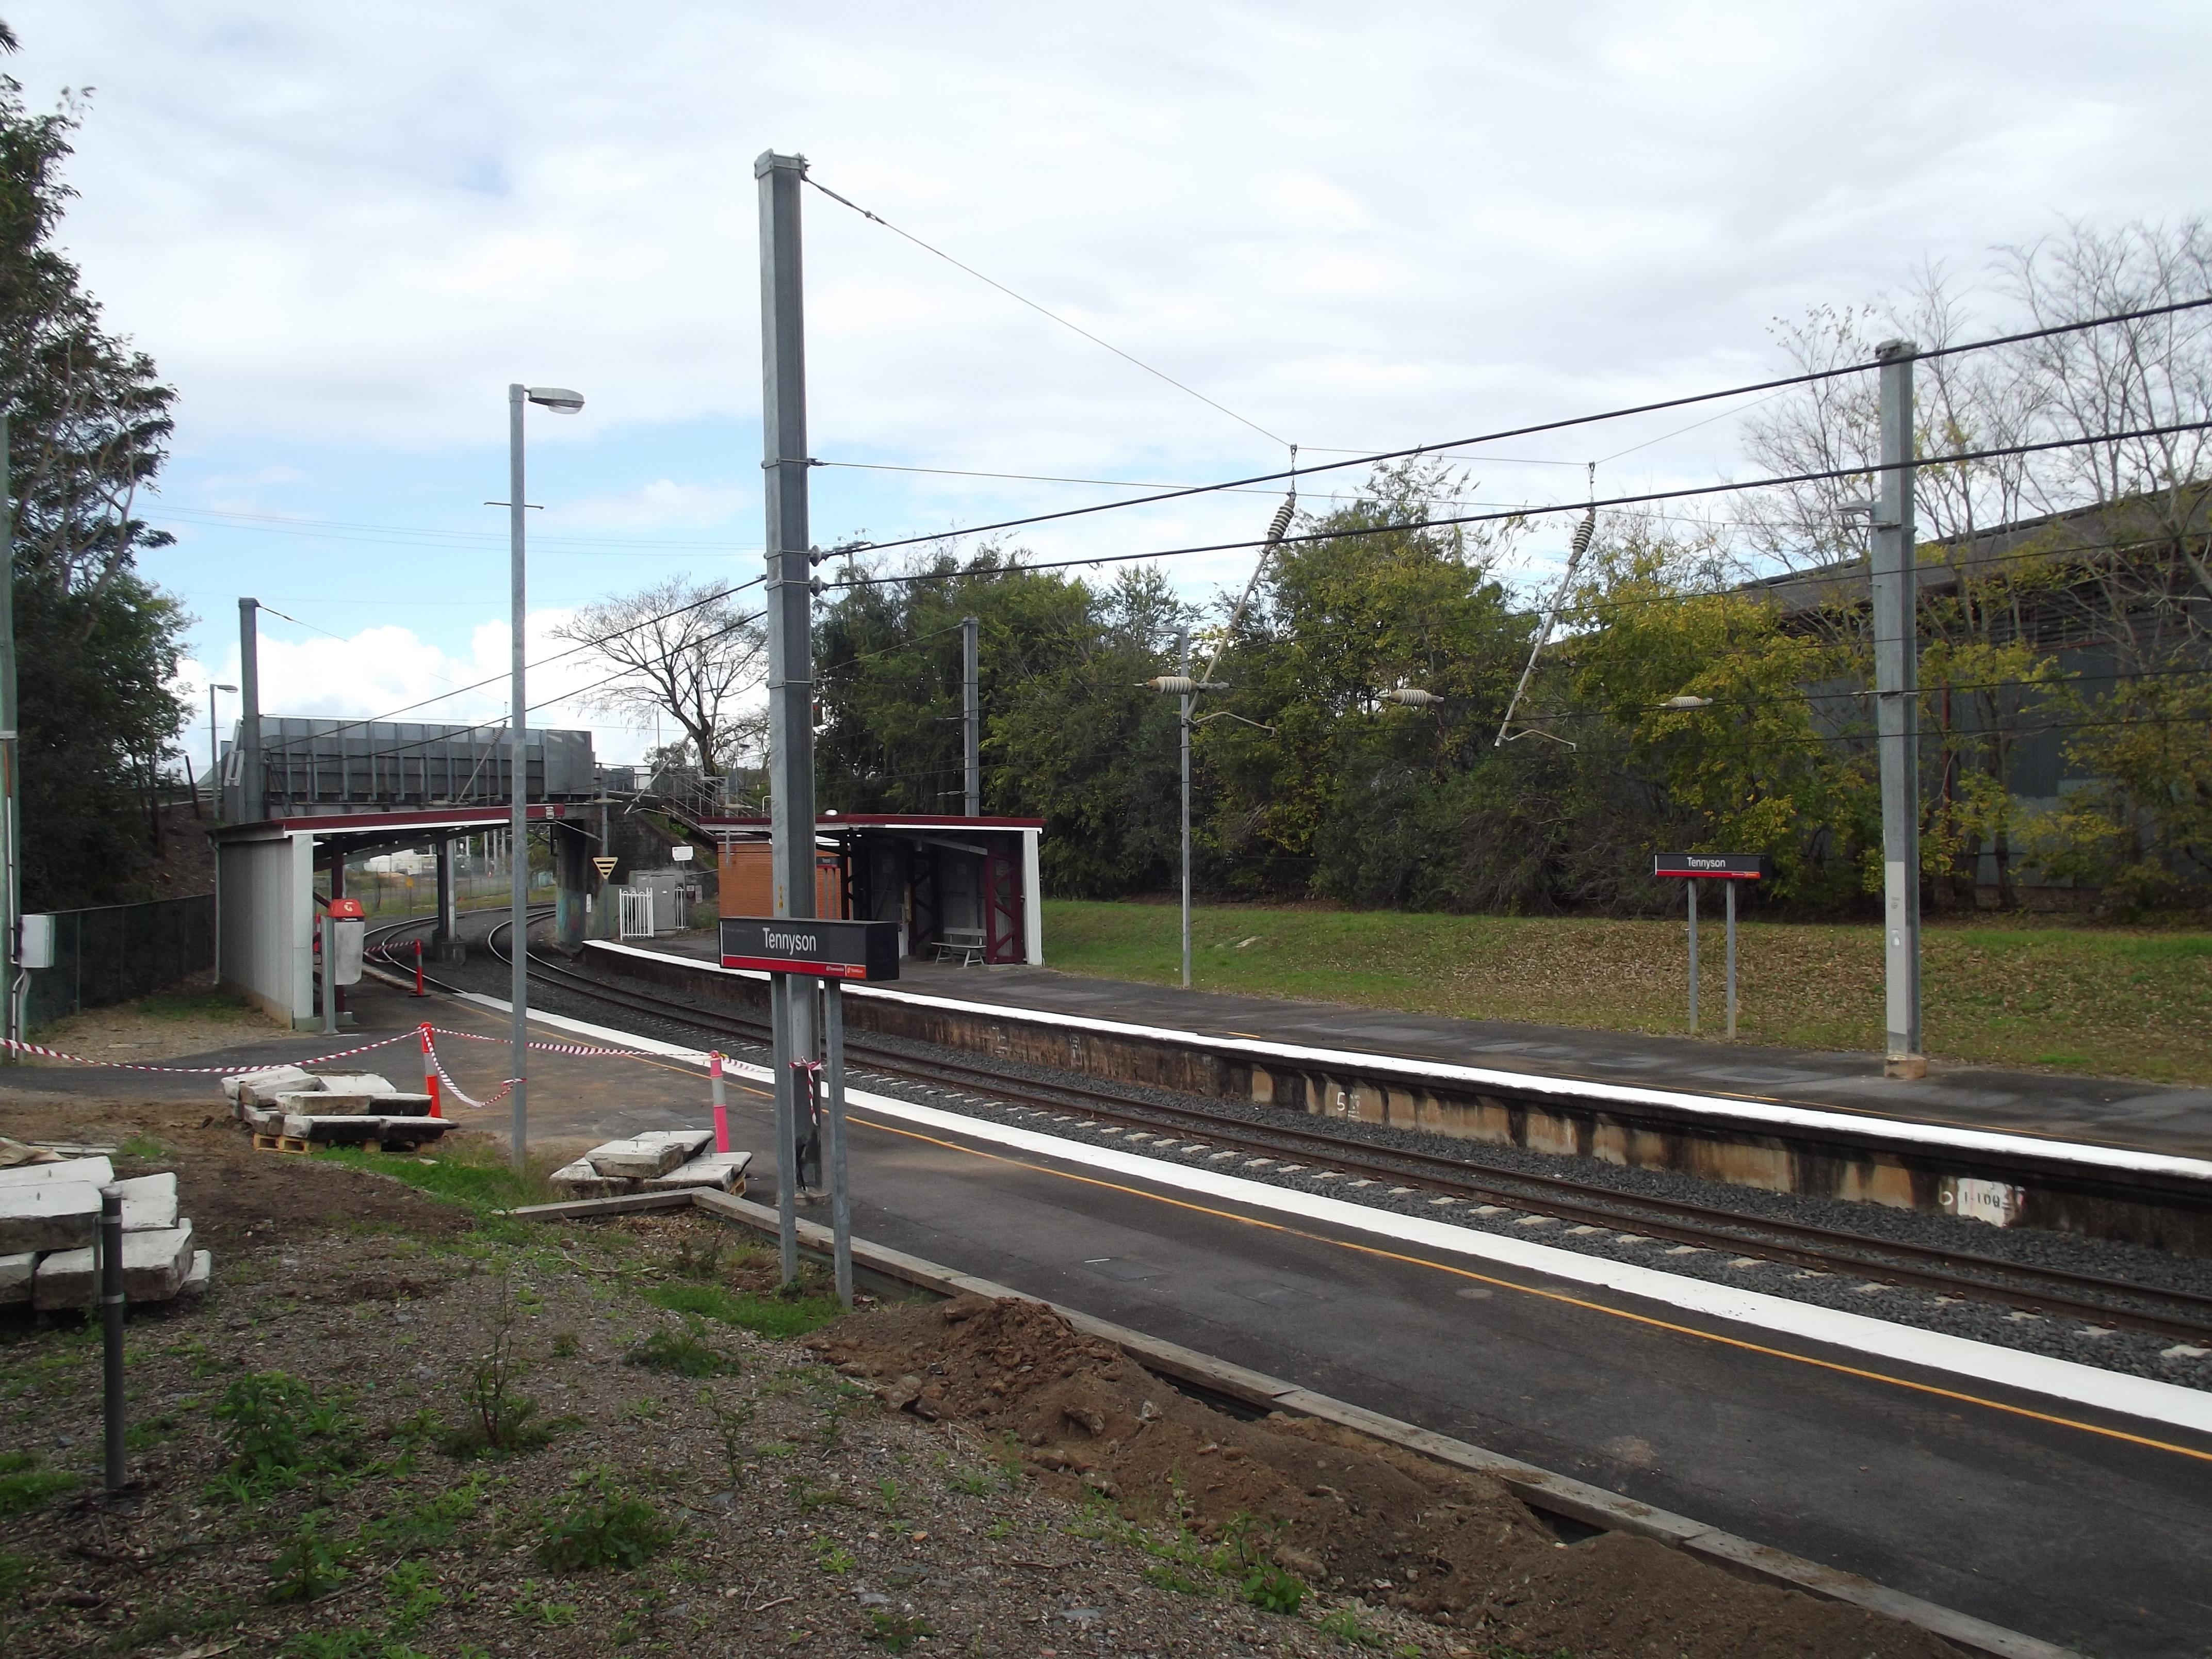 File:Tennyson Railway Station, Queensland, July 2012.JPG ...